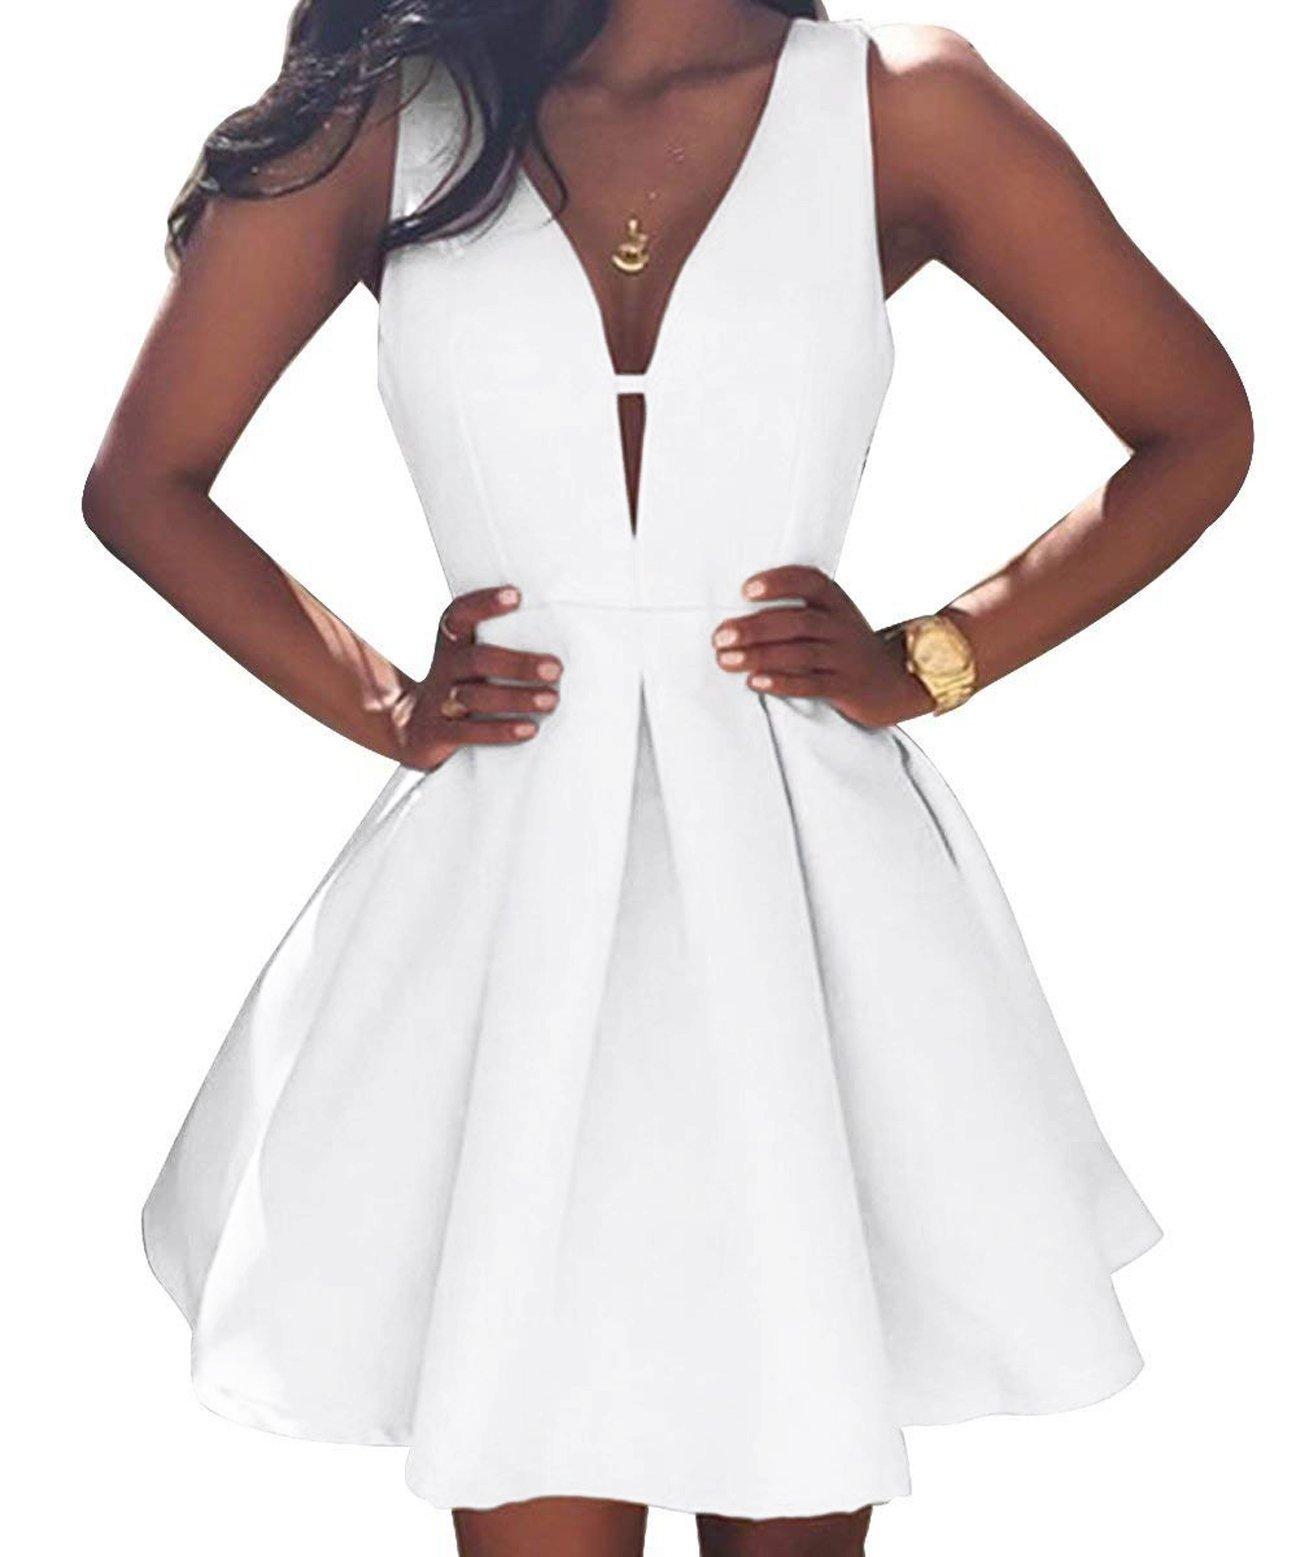 238e515960 Ellenhouse Women s V-Neck Sexy Mini Homecoming Dresses Short Party Gowns